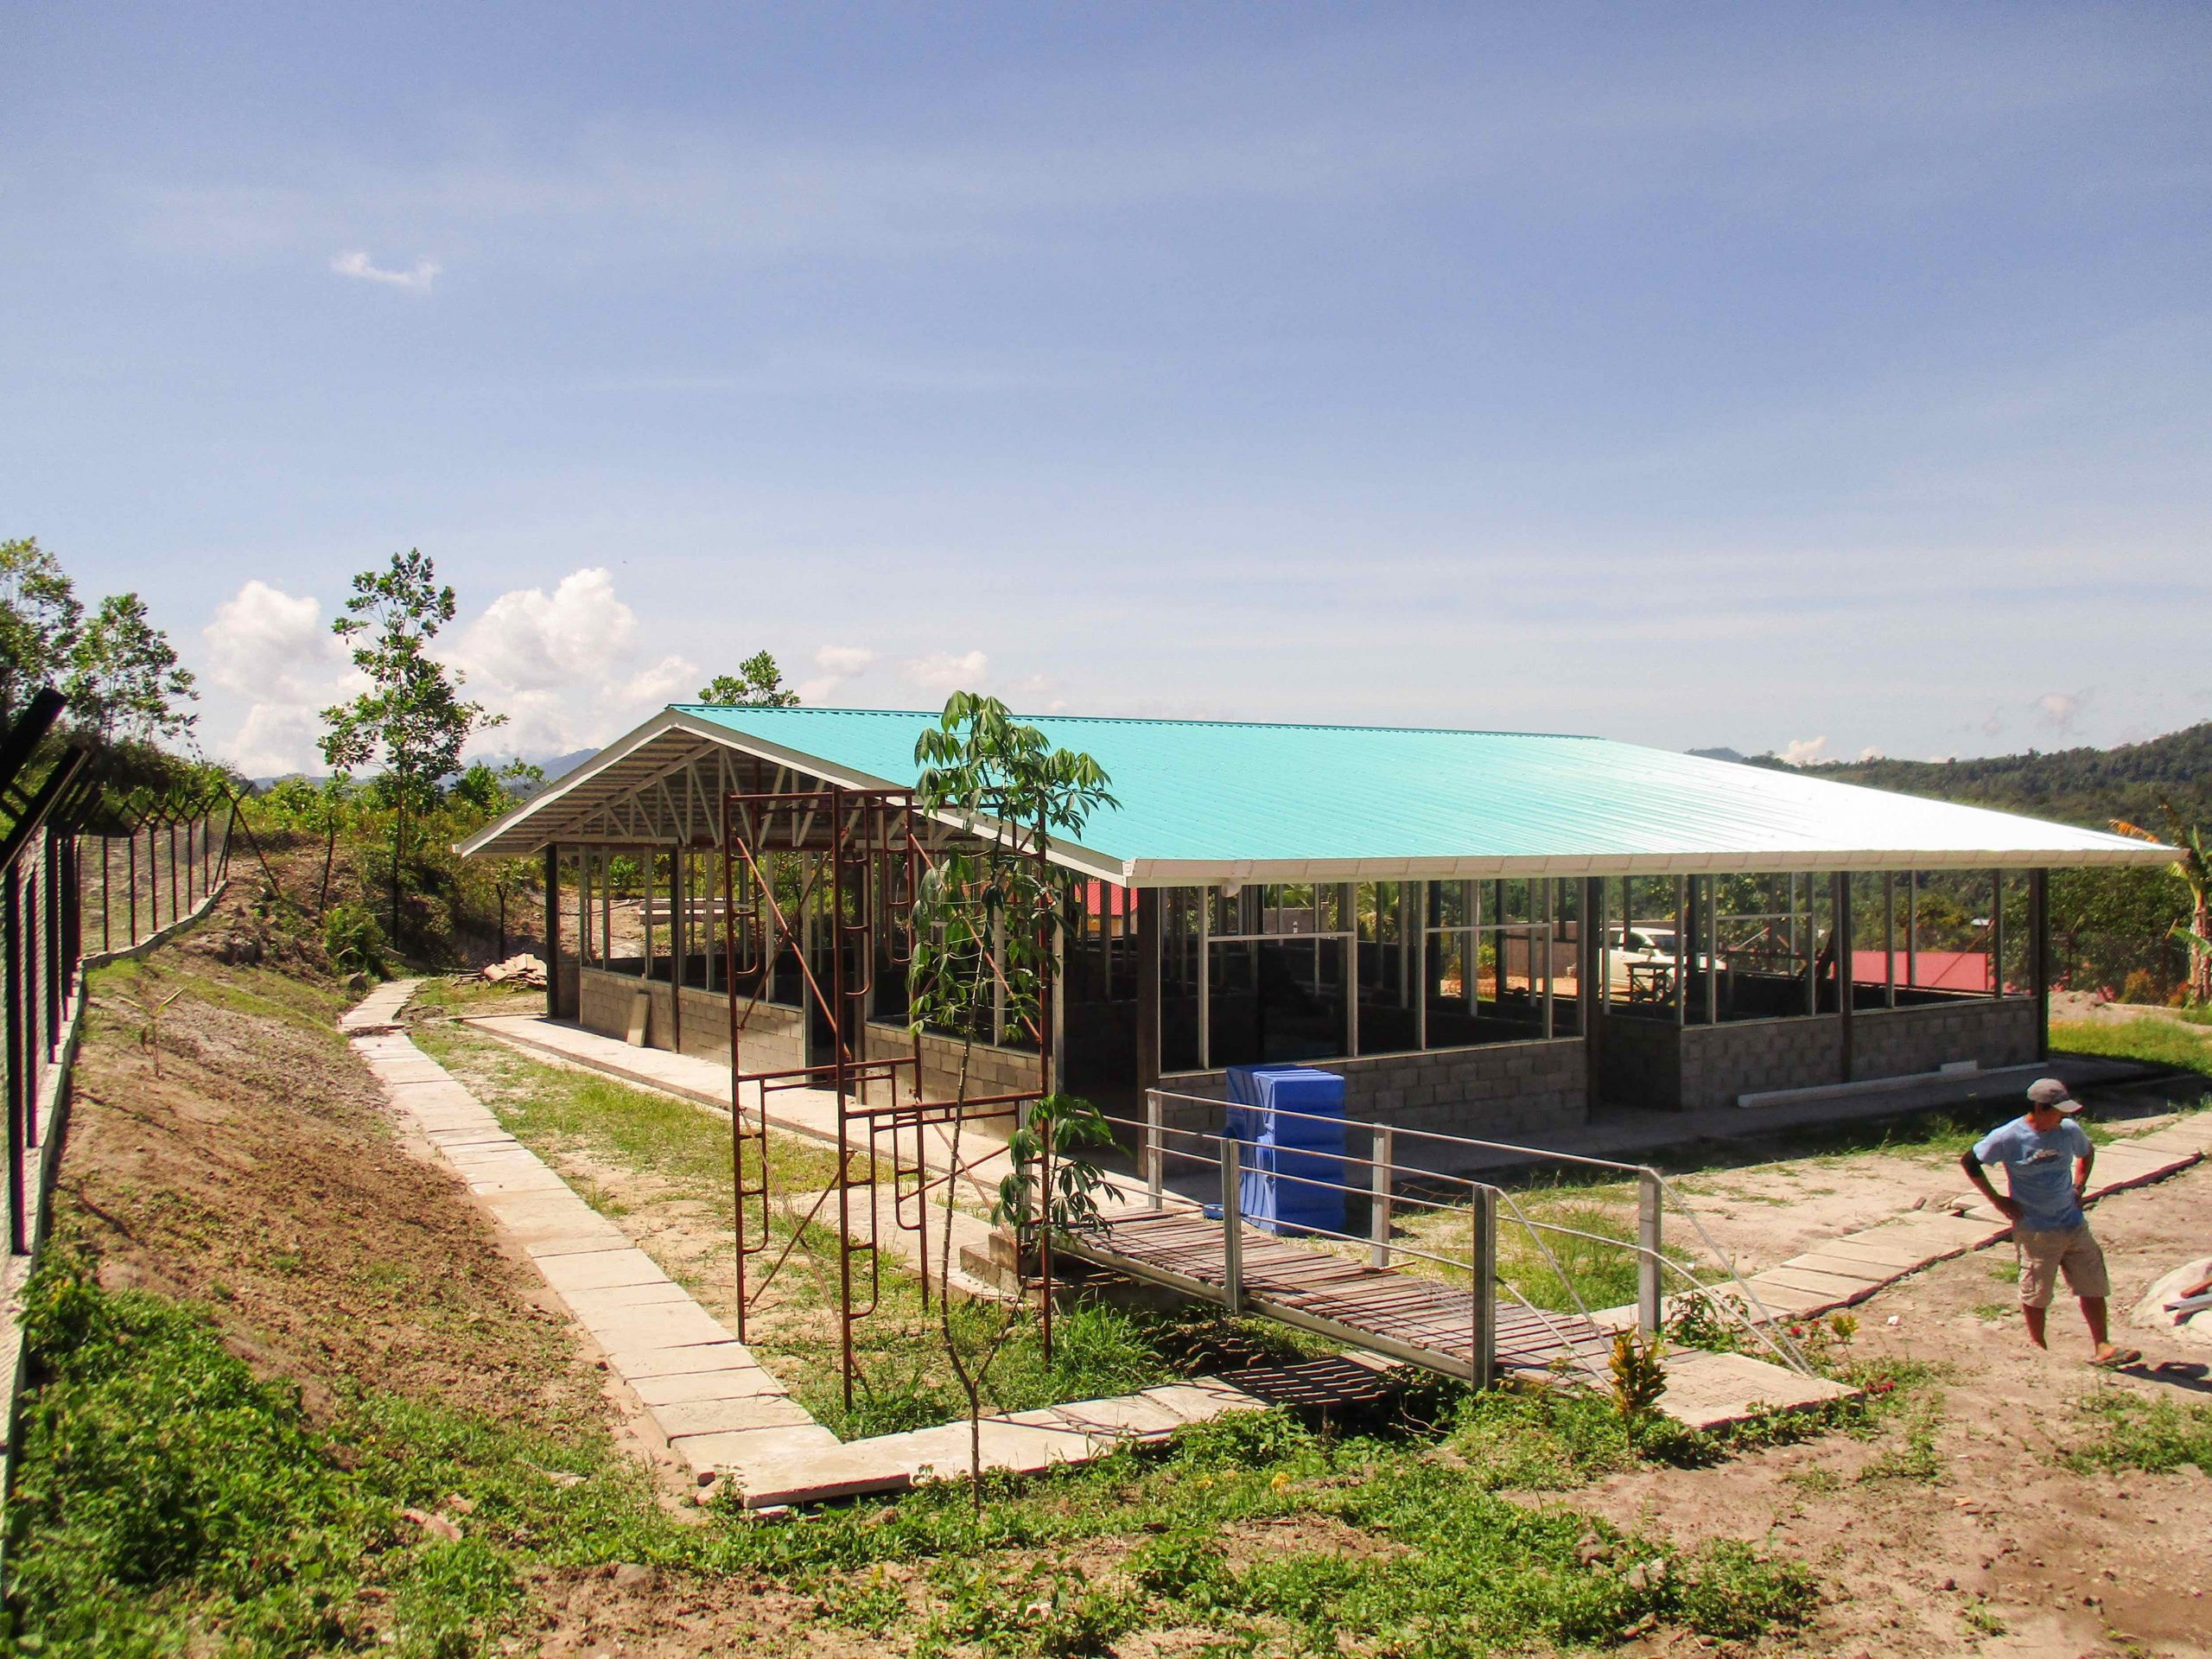 camps_international_bongkud_community_improvemen-2